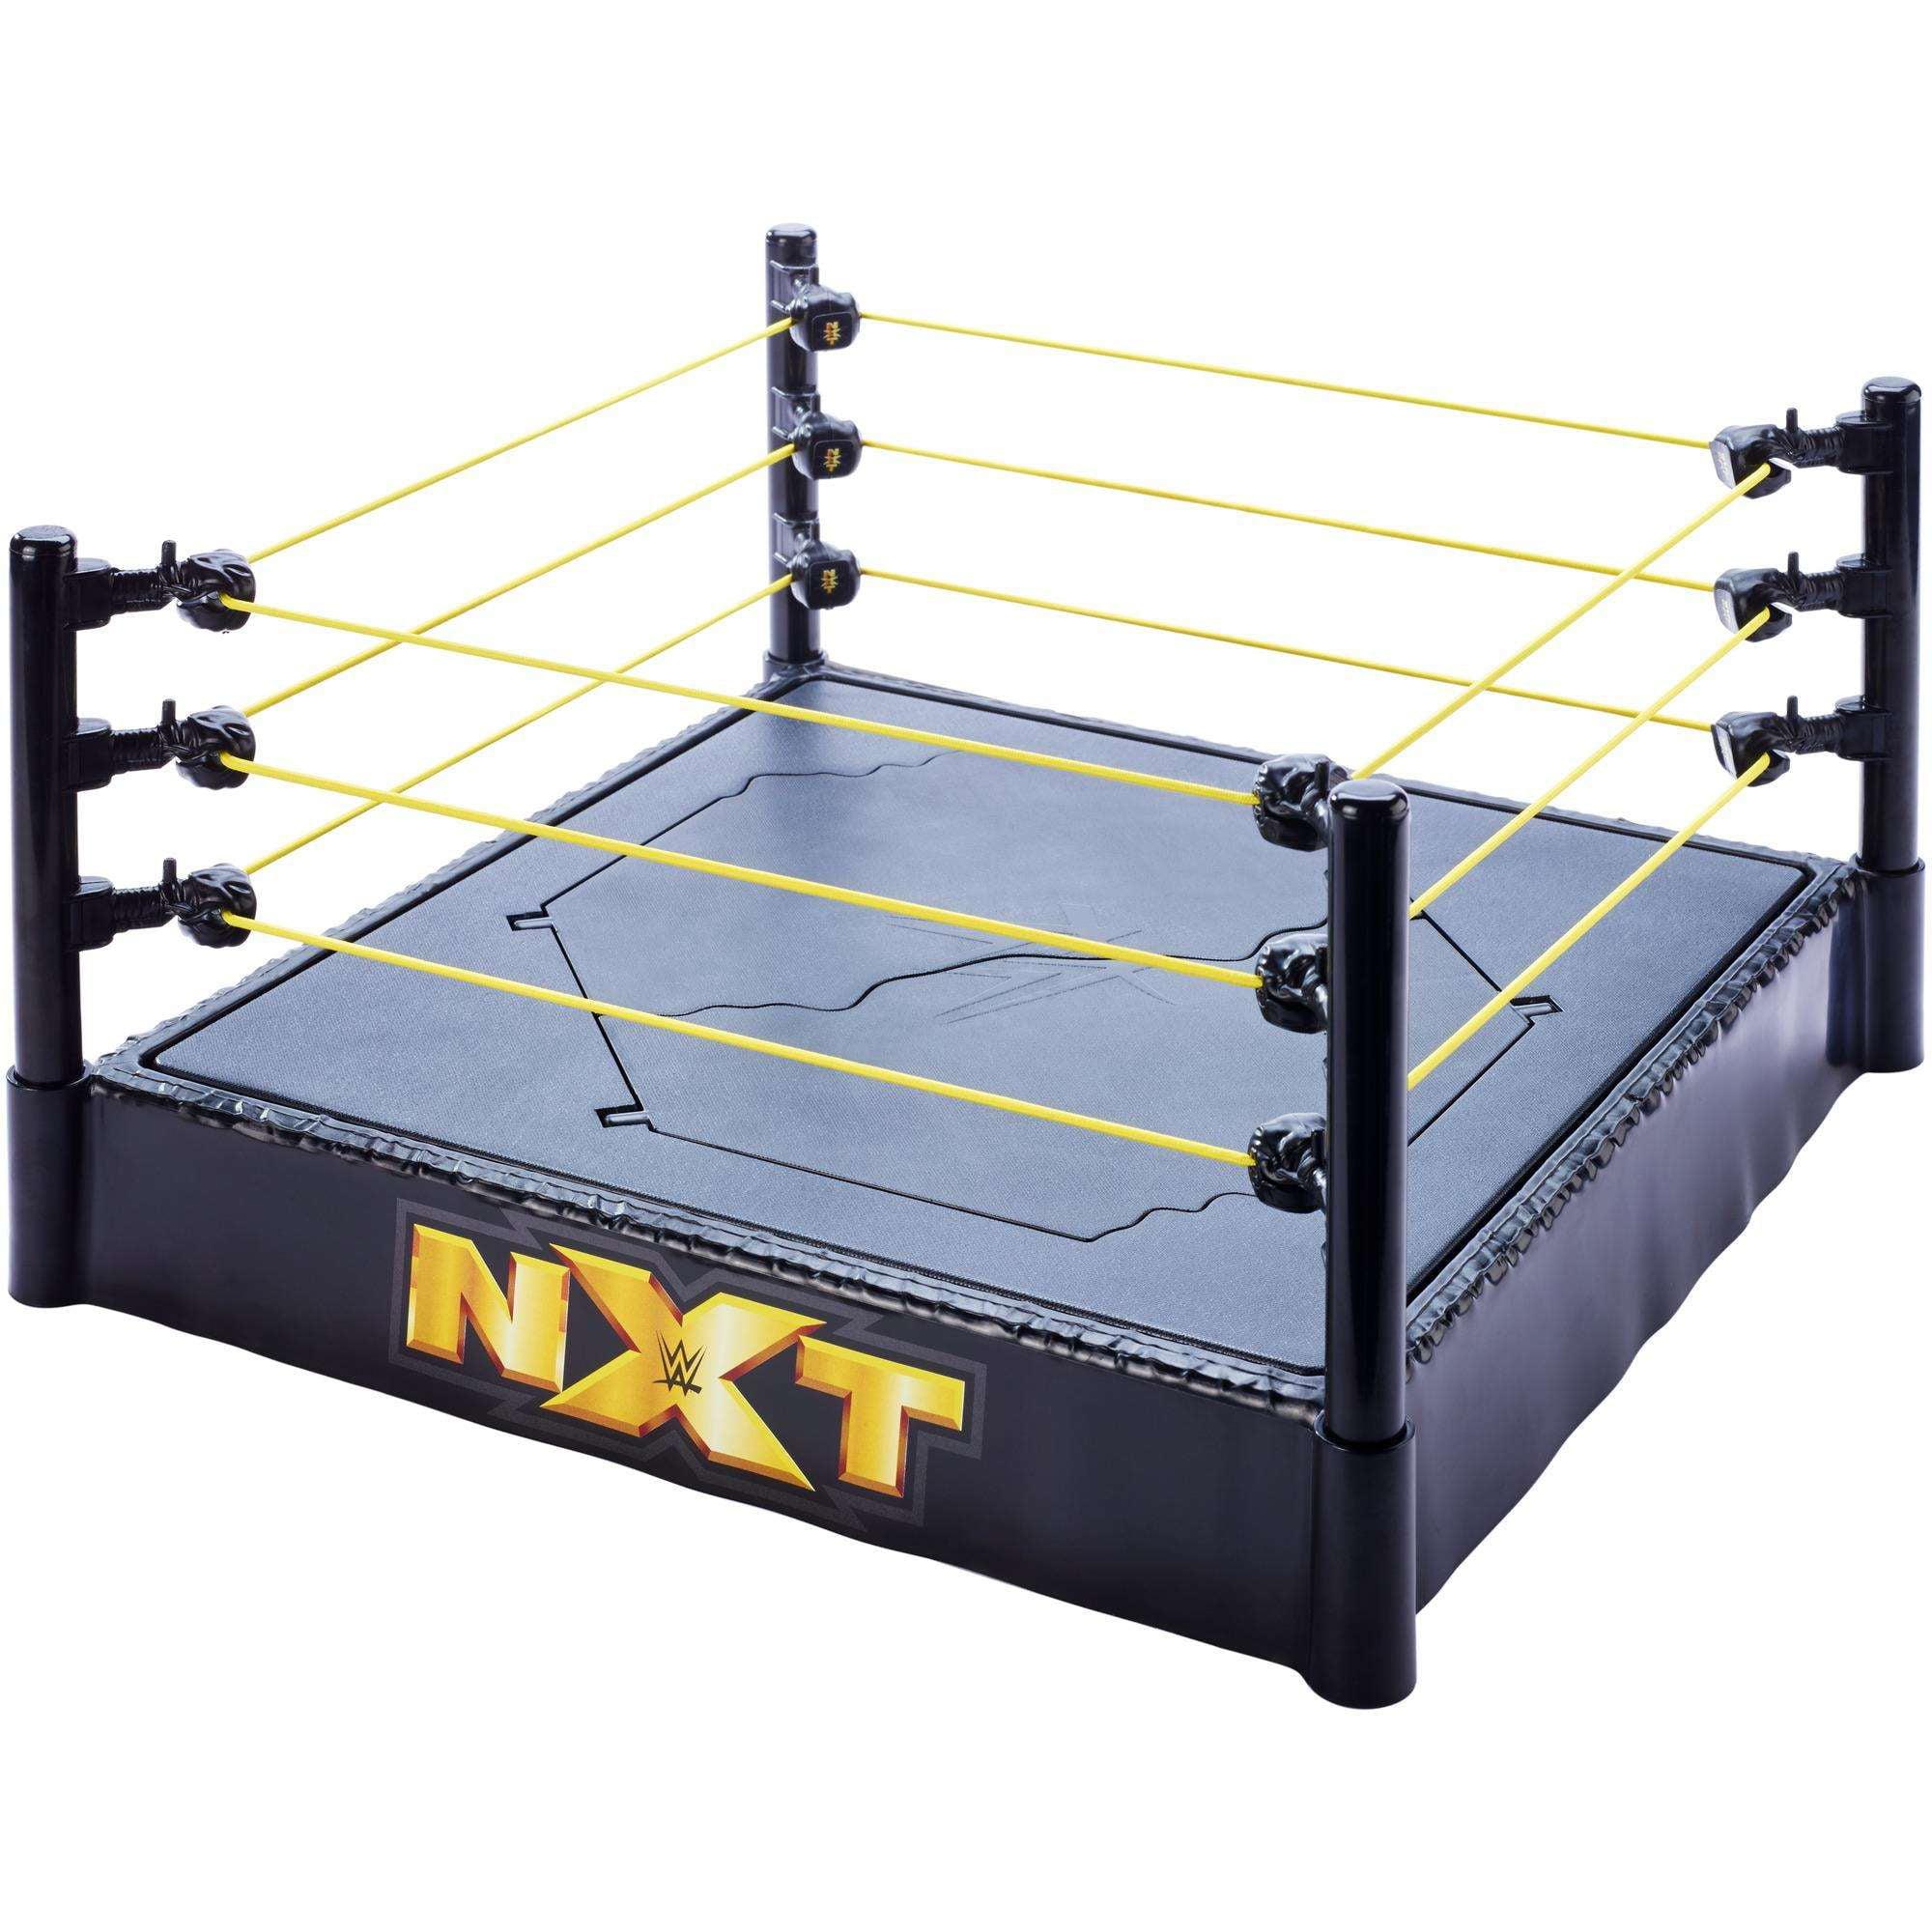 WWE Nxt Superstar Ring by Mattel